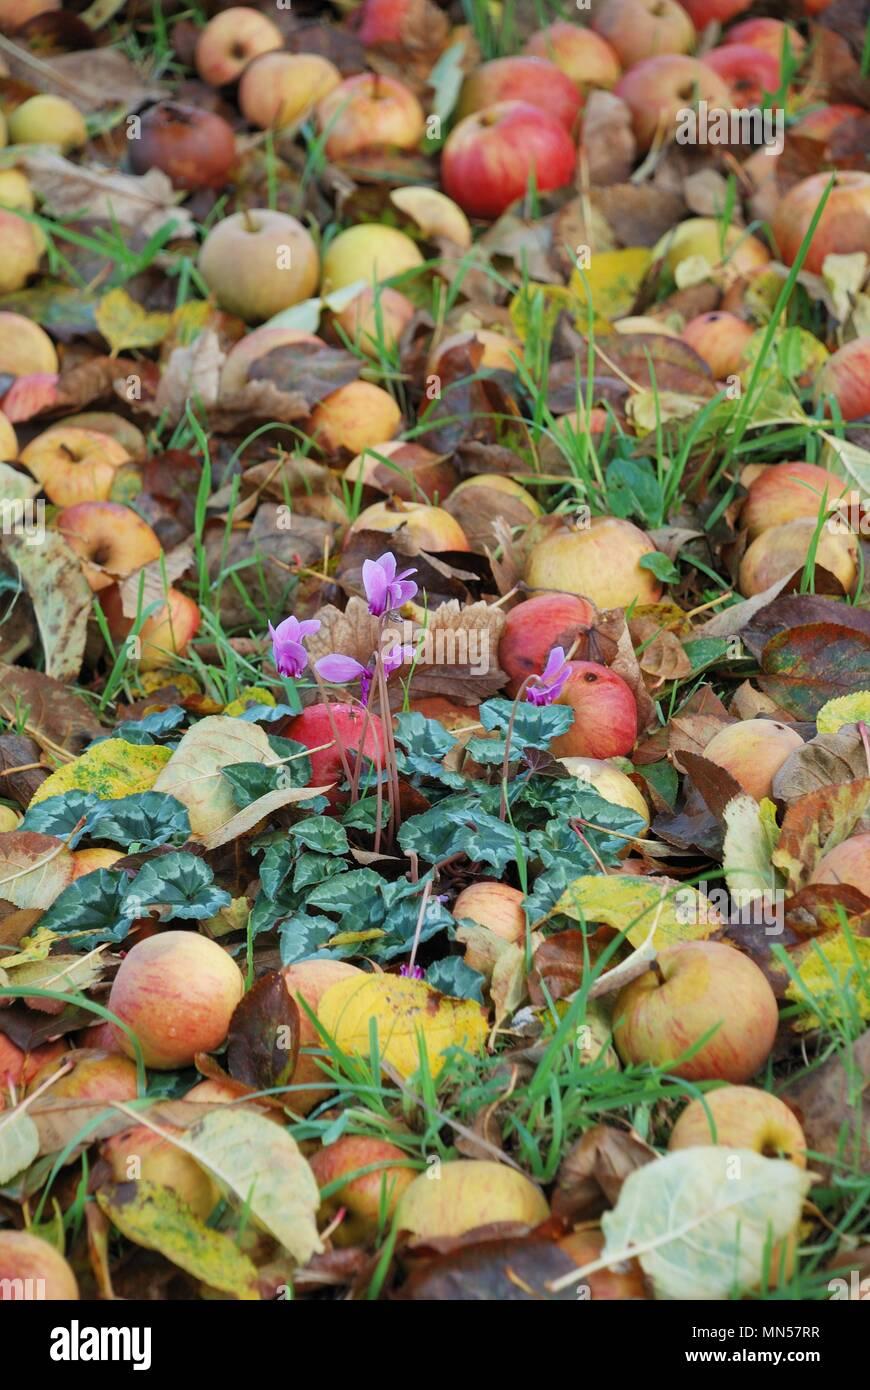 Apple cider - Stock Image